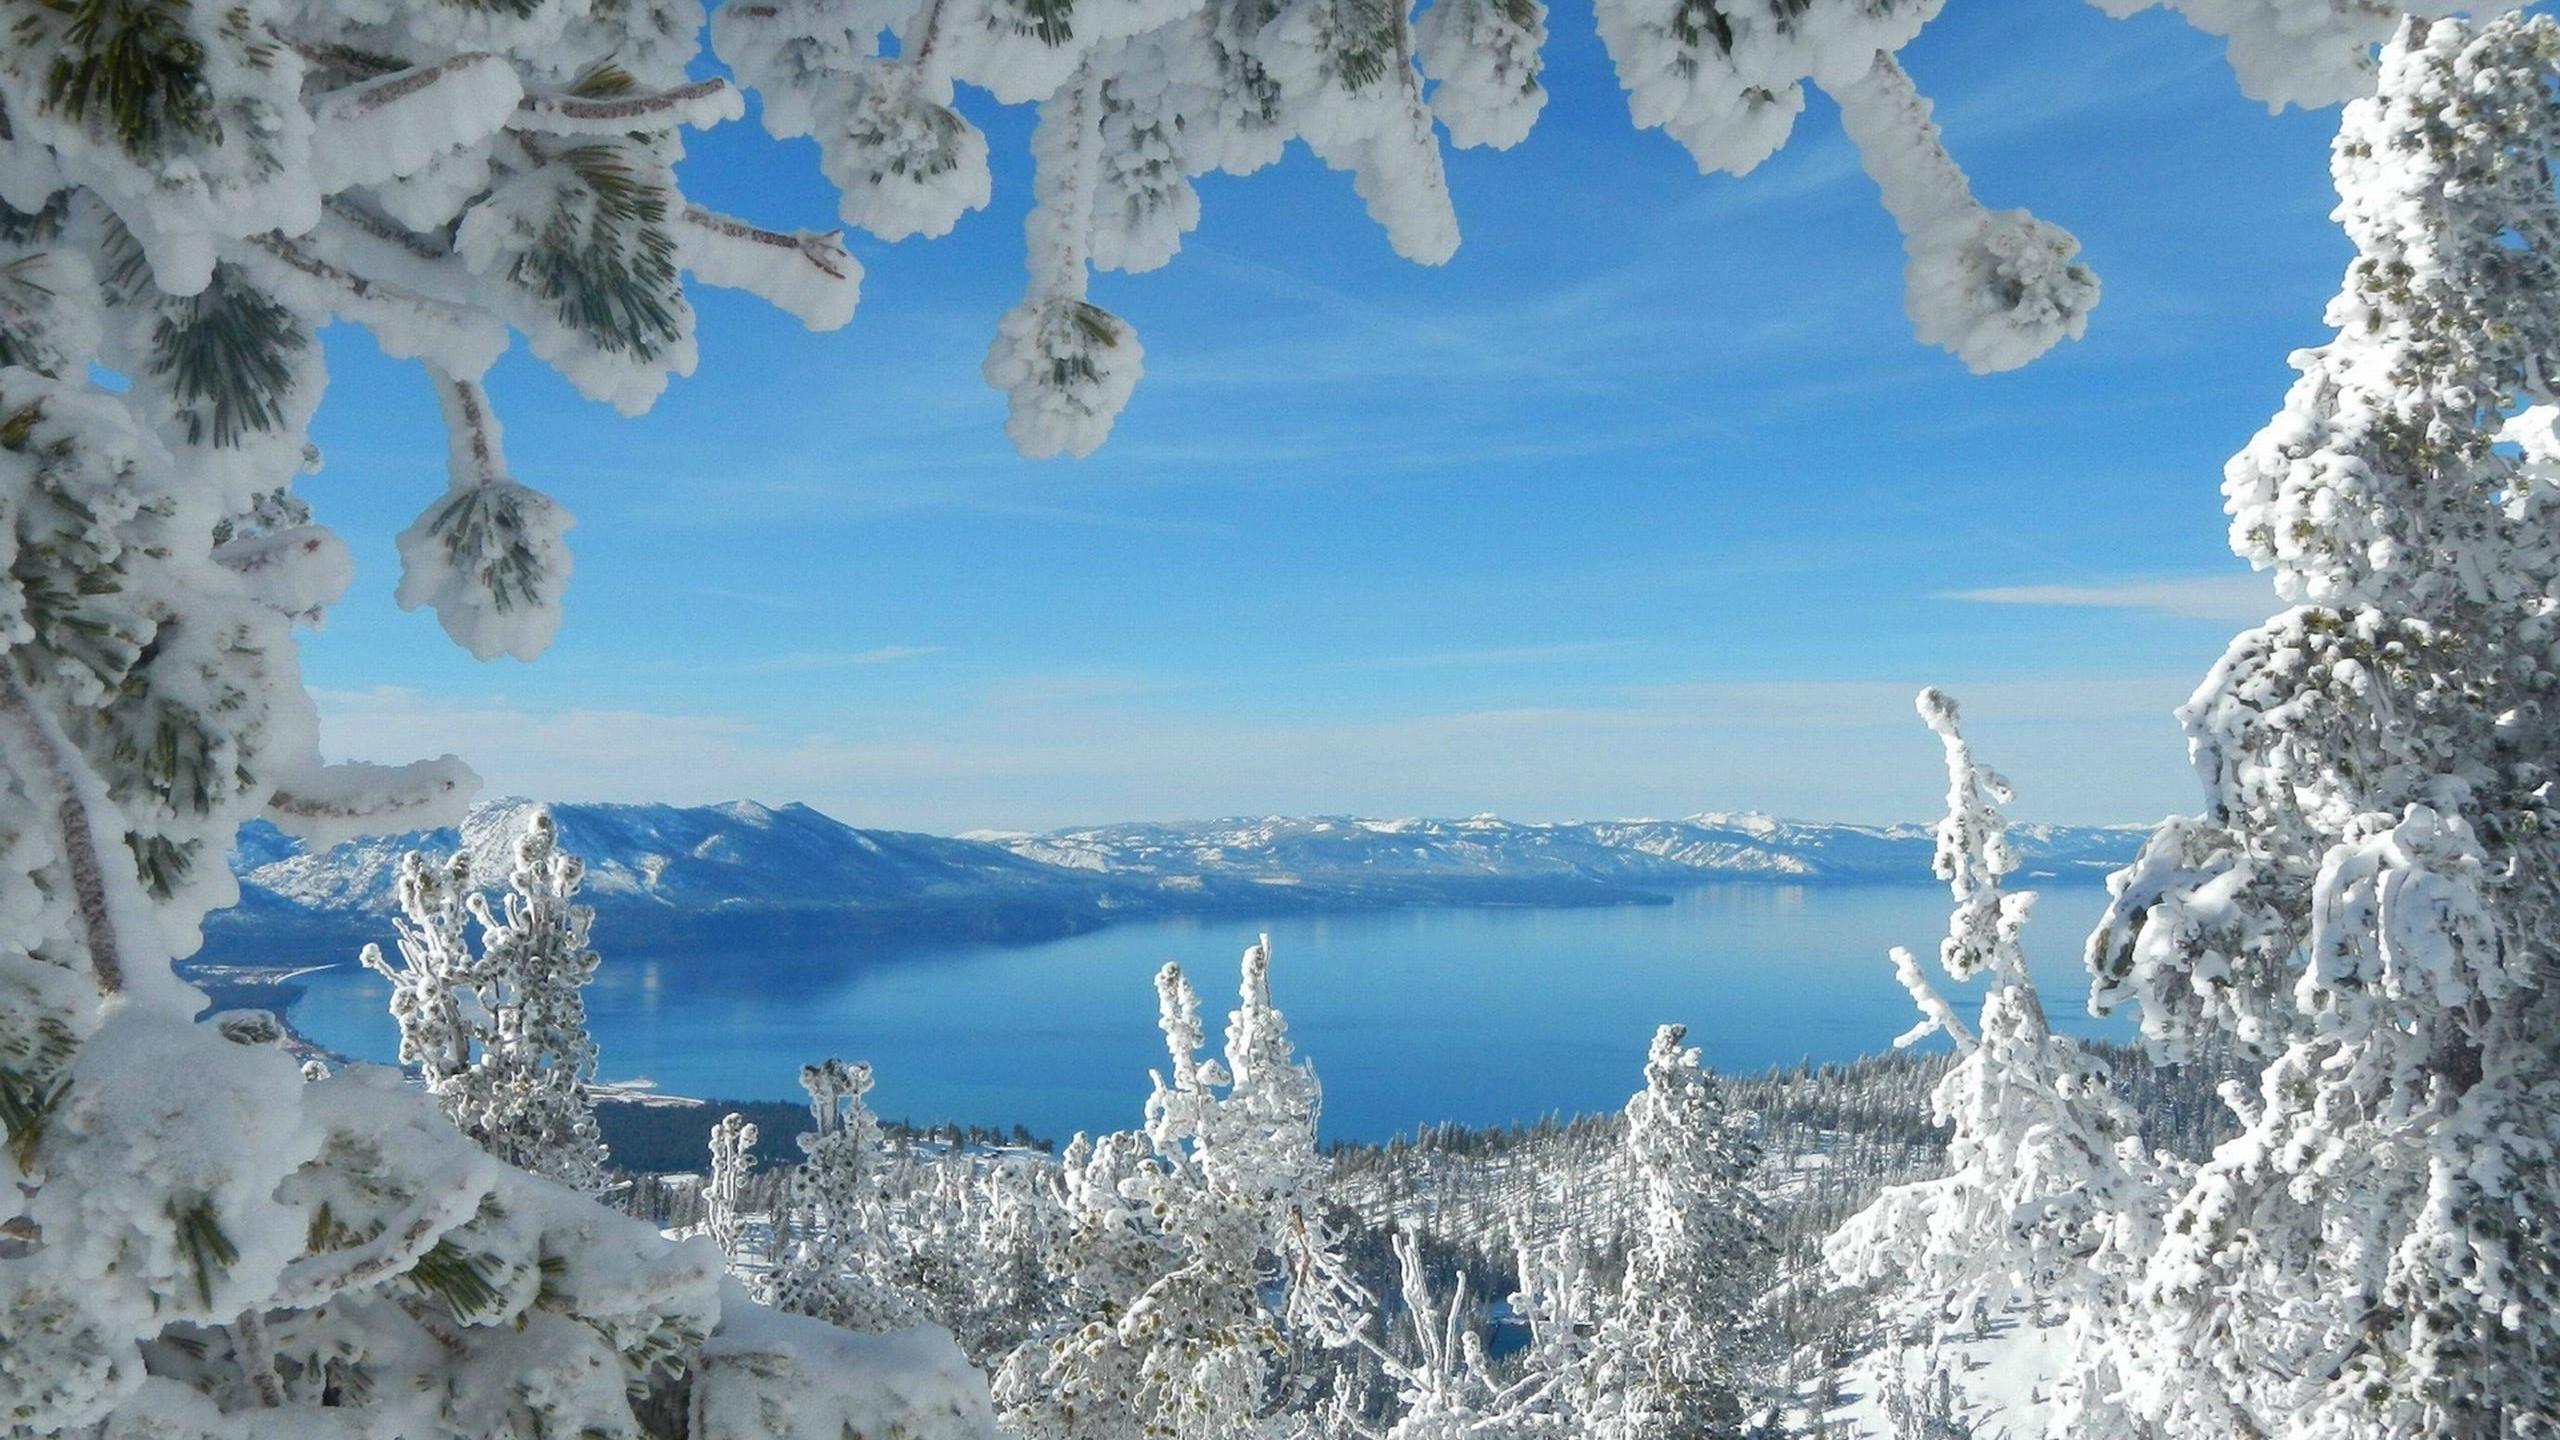 DOWNLOAD WALLPAPER Heavenly Lake Tahoe – FULL SIZE